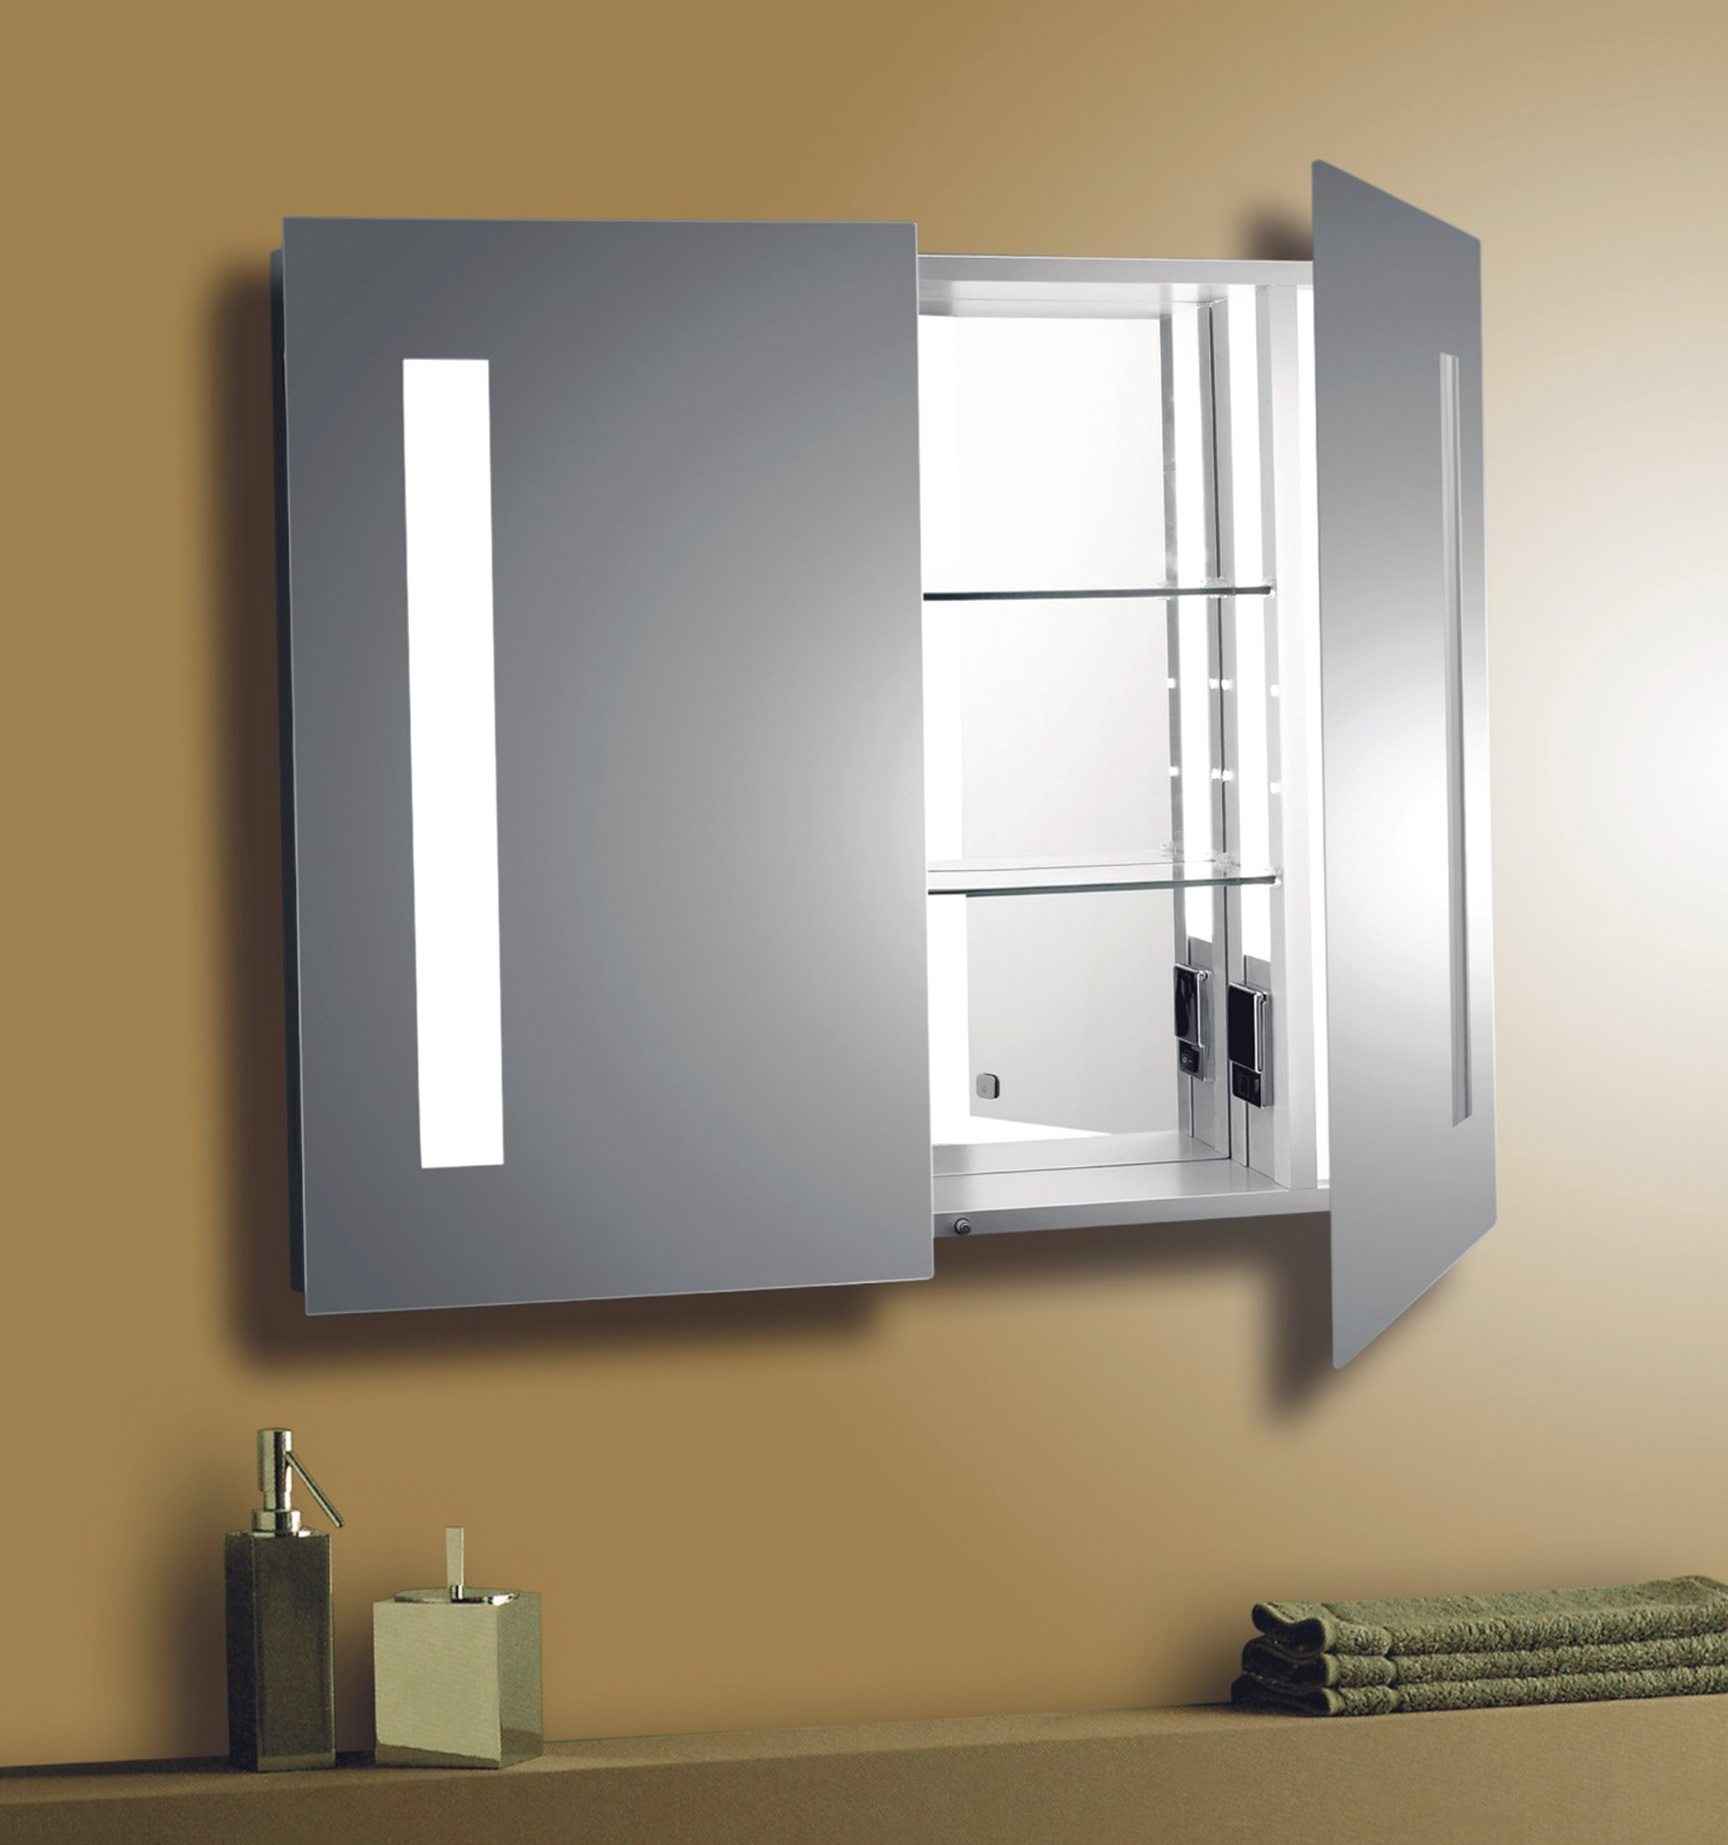 Kohler Medicine Cabinets Installation